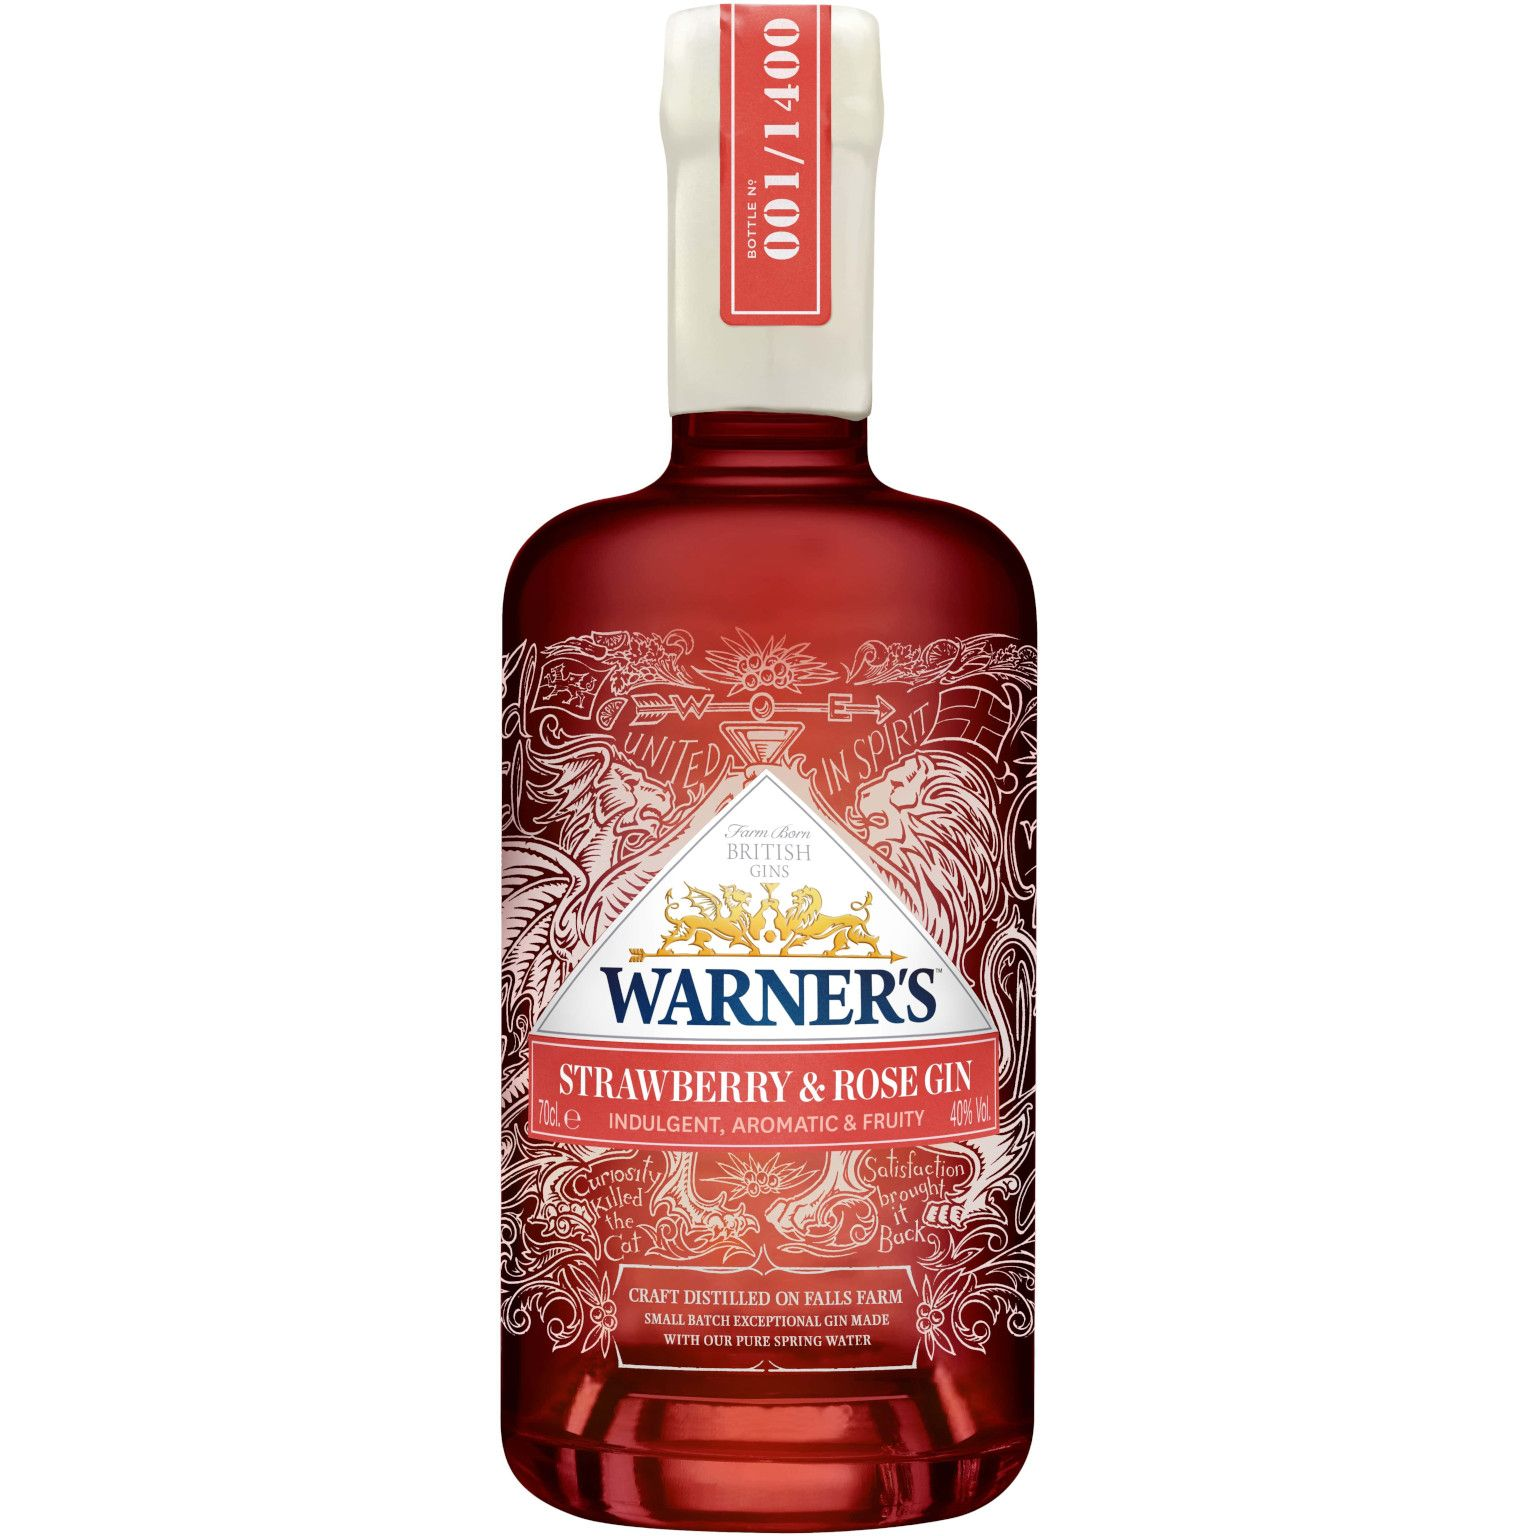 Warner Edwards Strawberry & Rose Gin 20,20L 420 Vol.